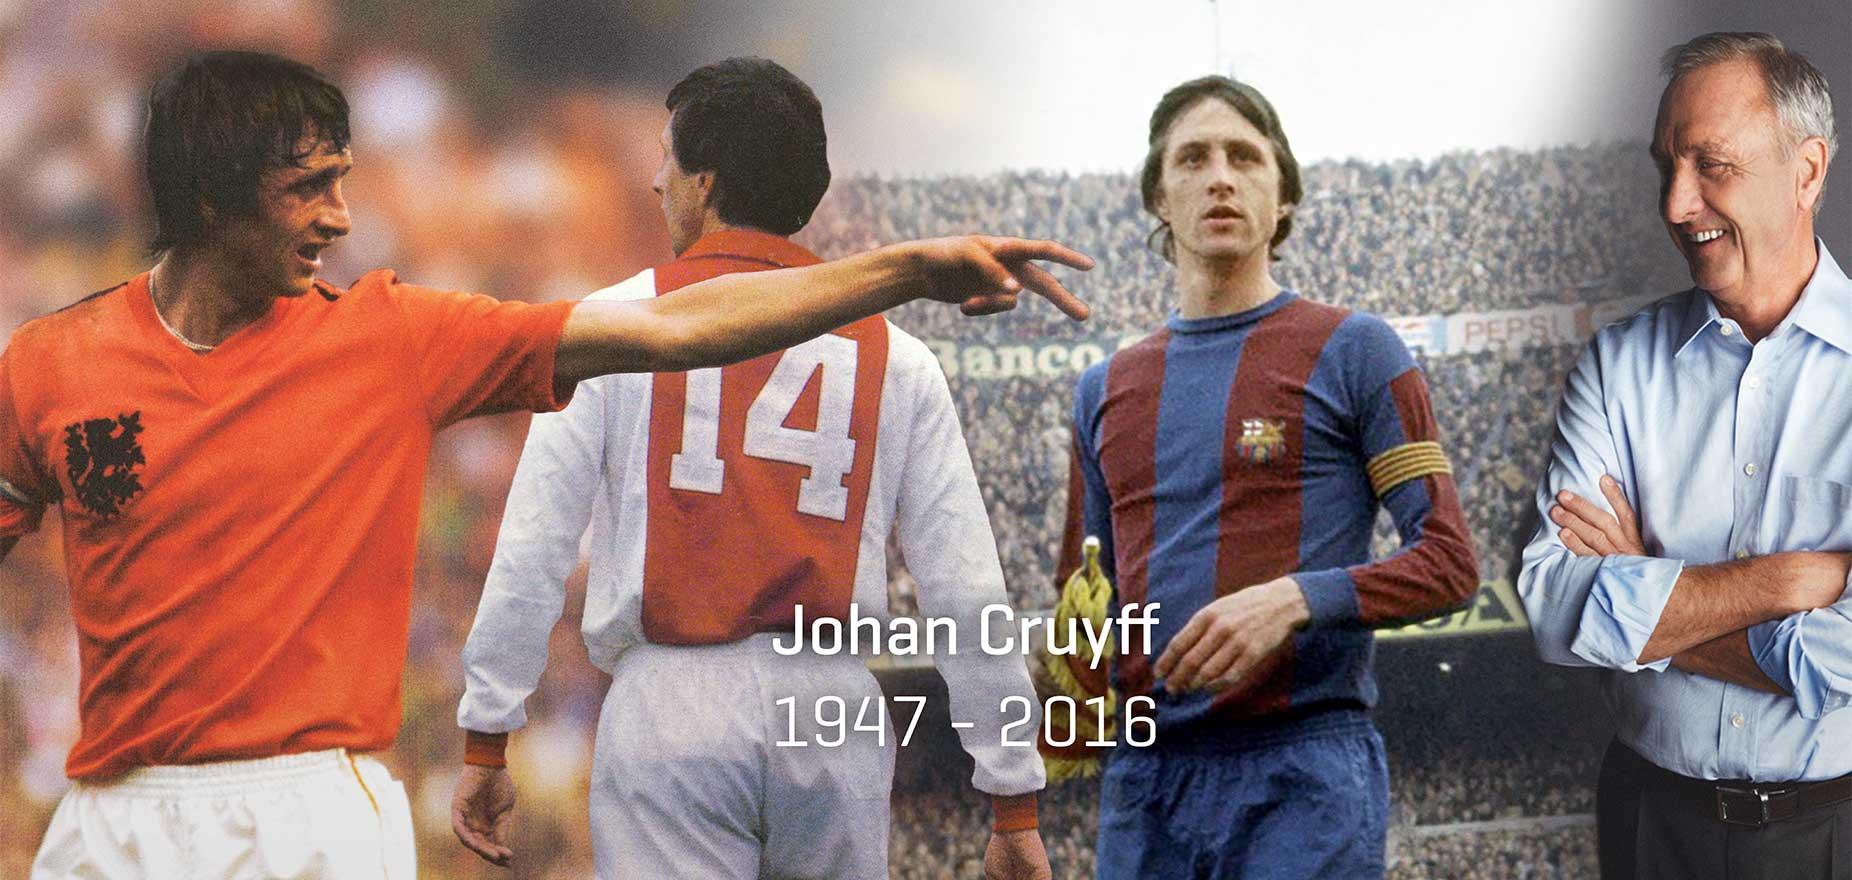 Johan Cruyff Memoriam